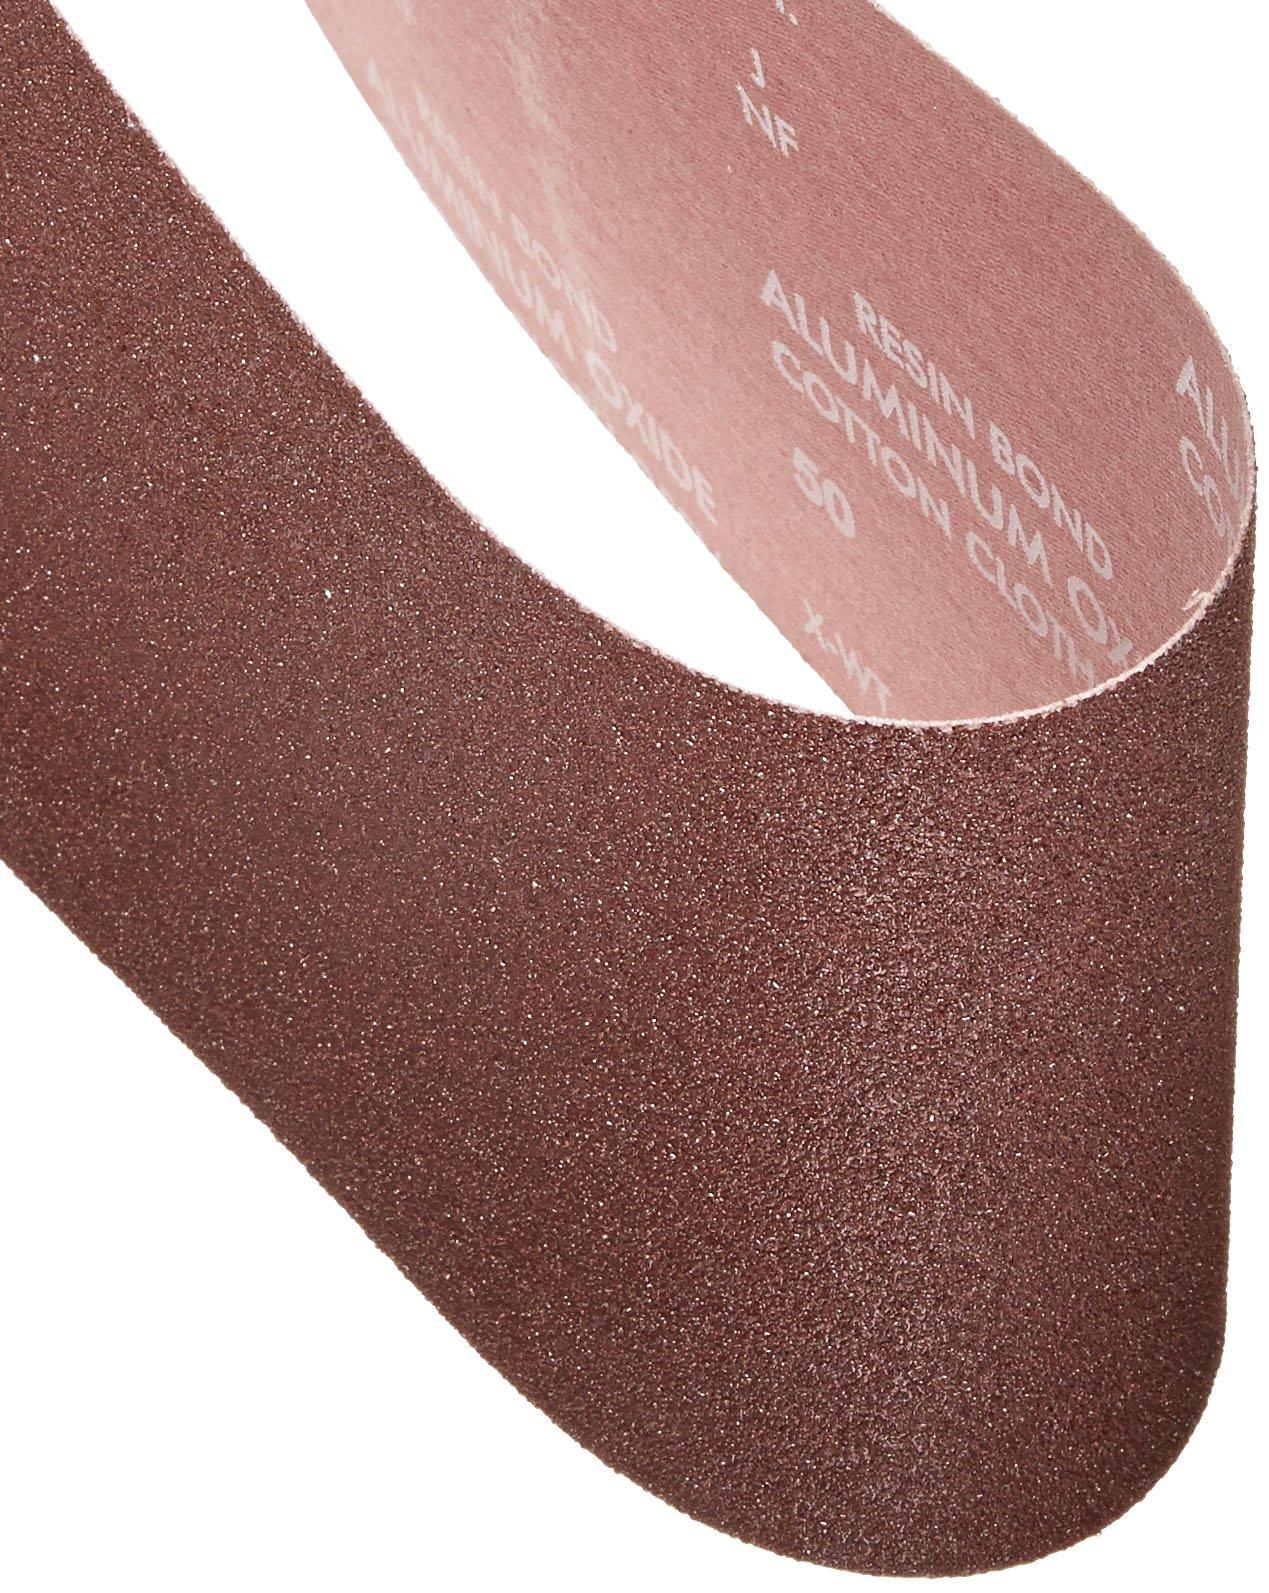 Norton 78072727985 BenchStand Abrasive Belt, Cotton Fiber Backing, Aluminum Oxide, 48'' Length x 6'' Width, Grit 50X Coarse (Pack of 10)